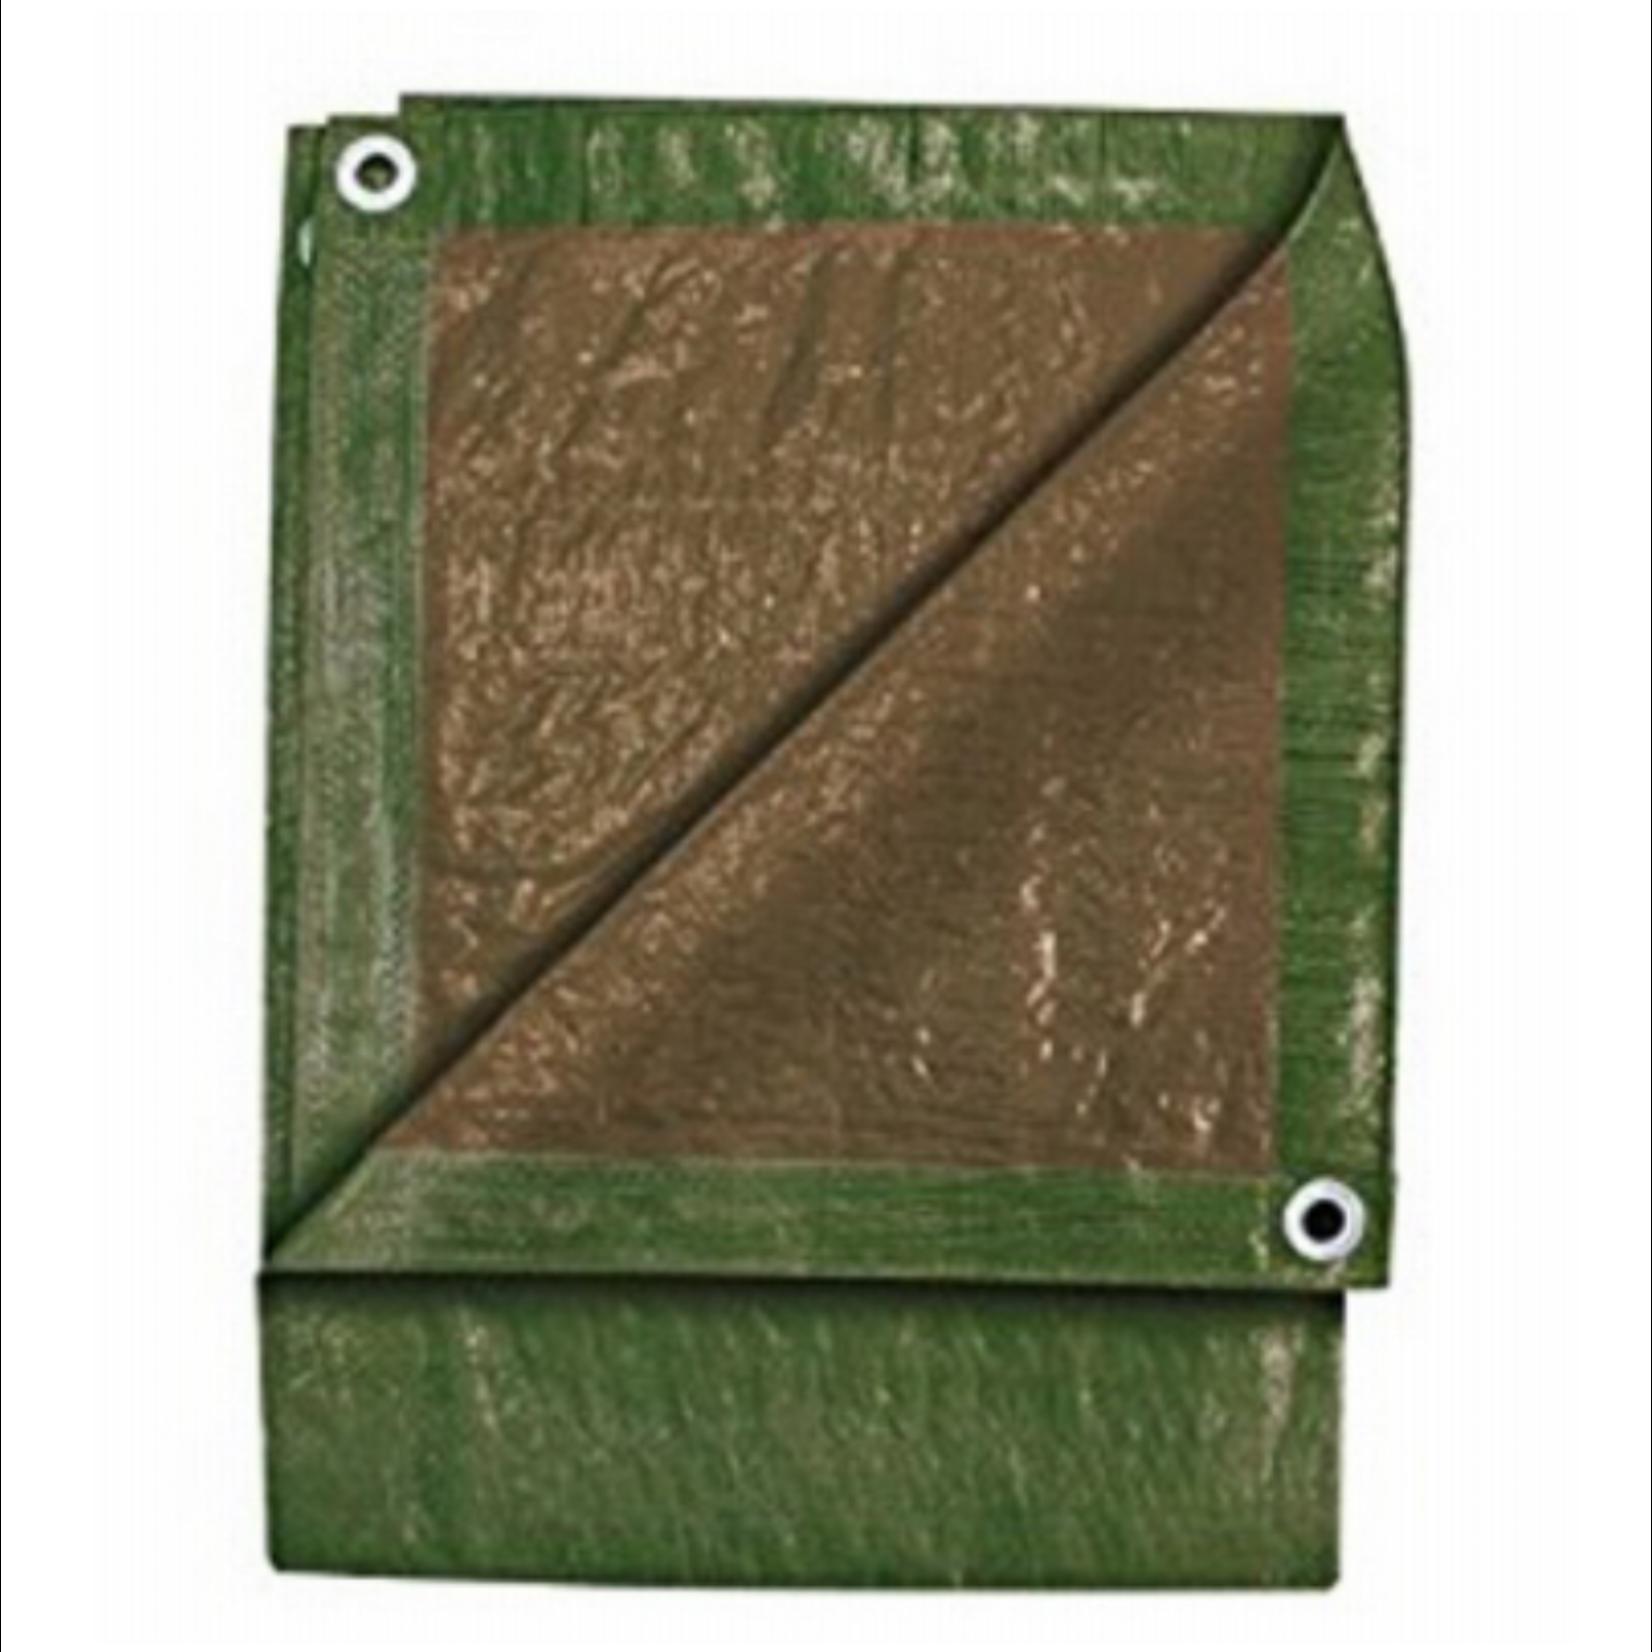 10573 Tru-Guard Wood Pile Tarp